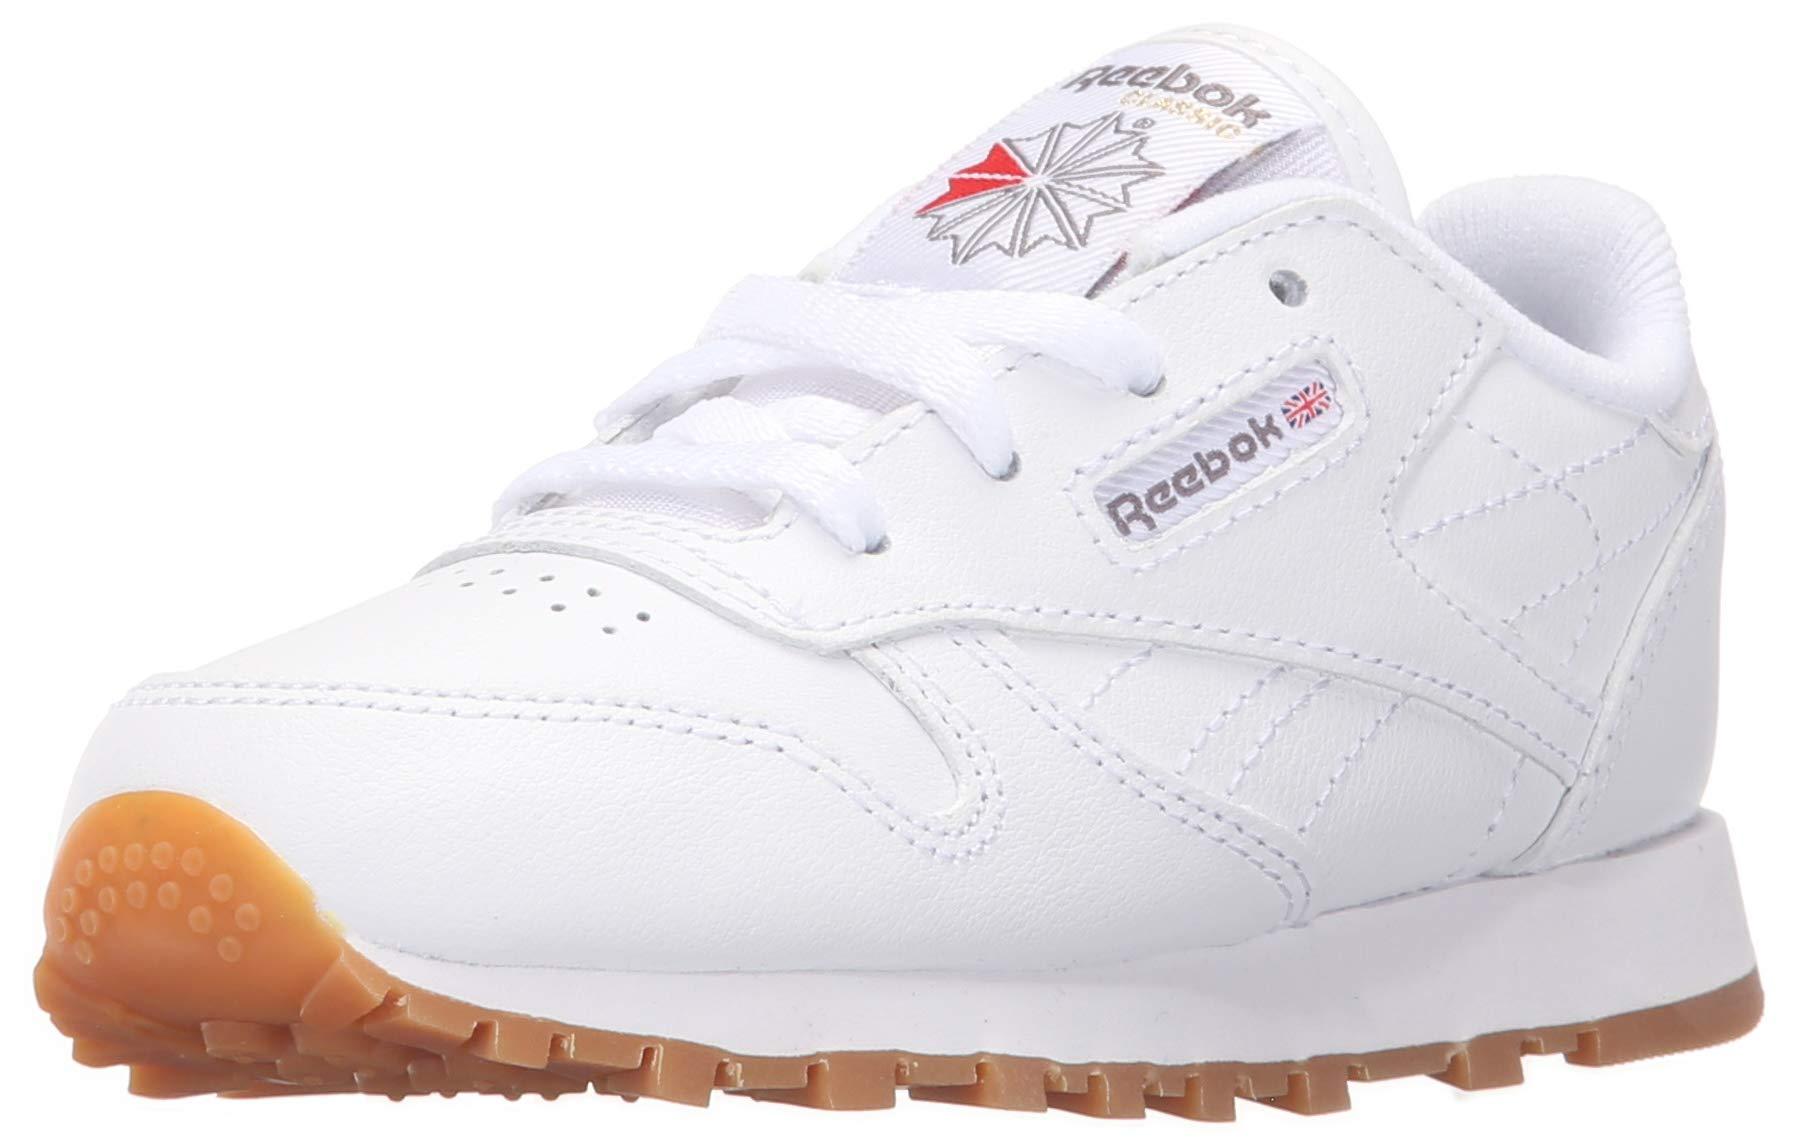 Reebok Kid's Classic Leather Shoe, White/Gum 4.5 M US Big Kid